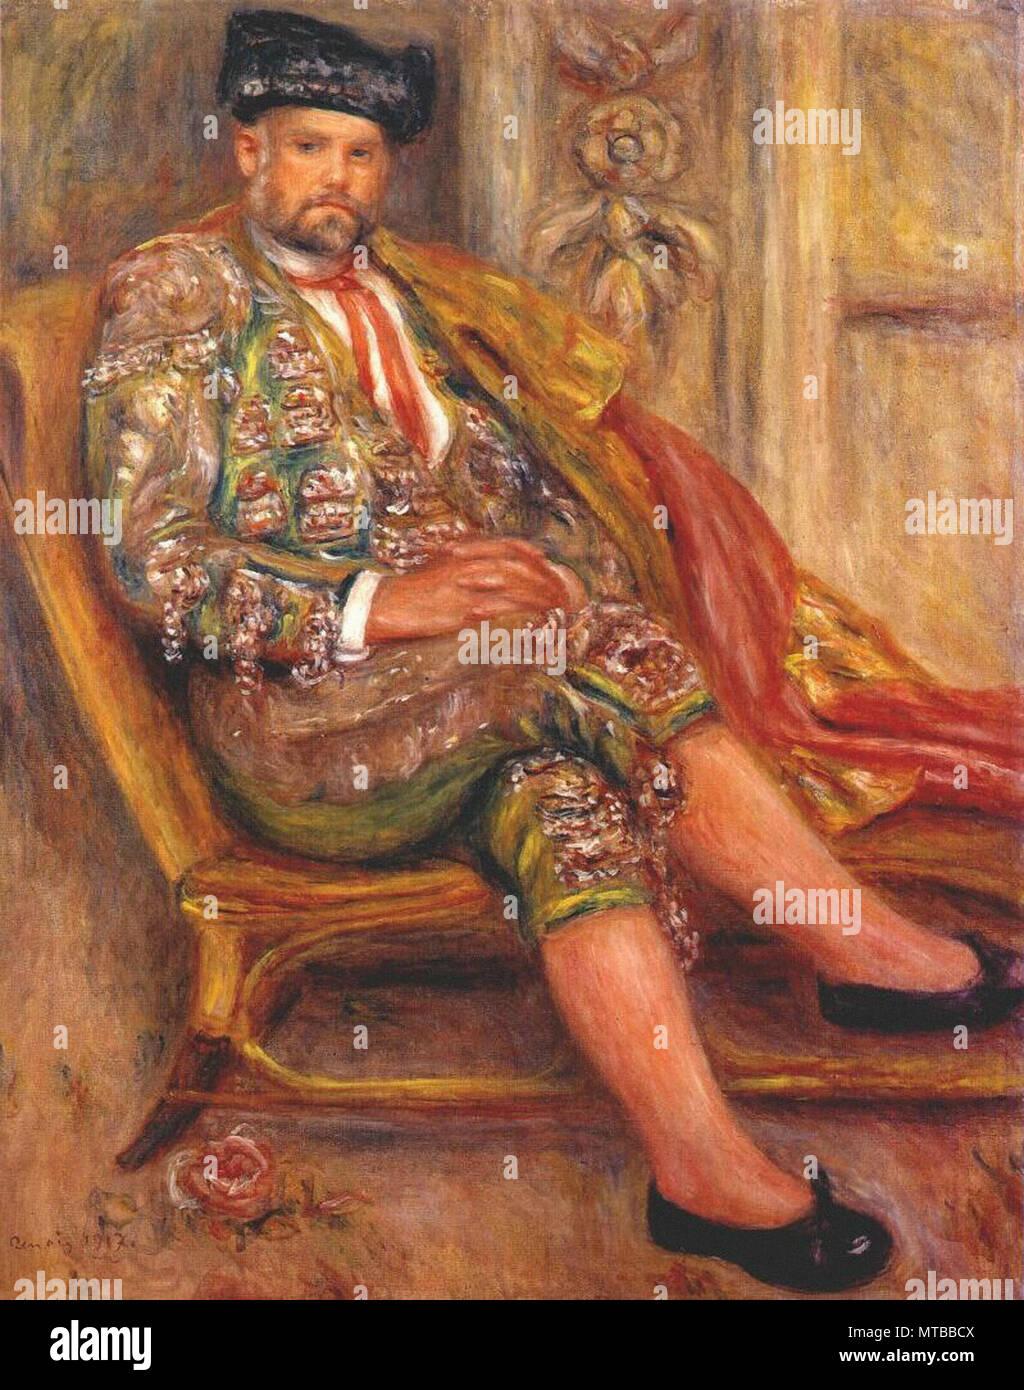 Renoir Pierre-Auguste - Ambroise Vollard Dressed as a Toreador 1917 - Stock Image